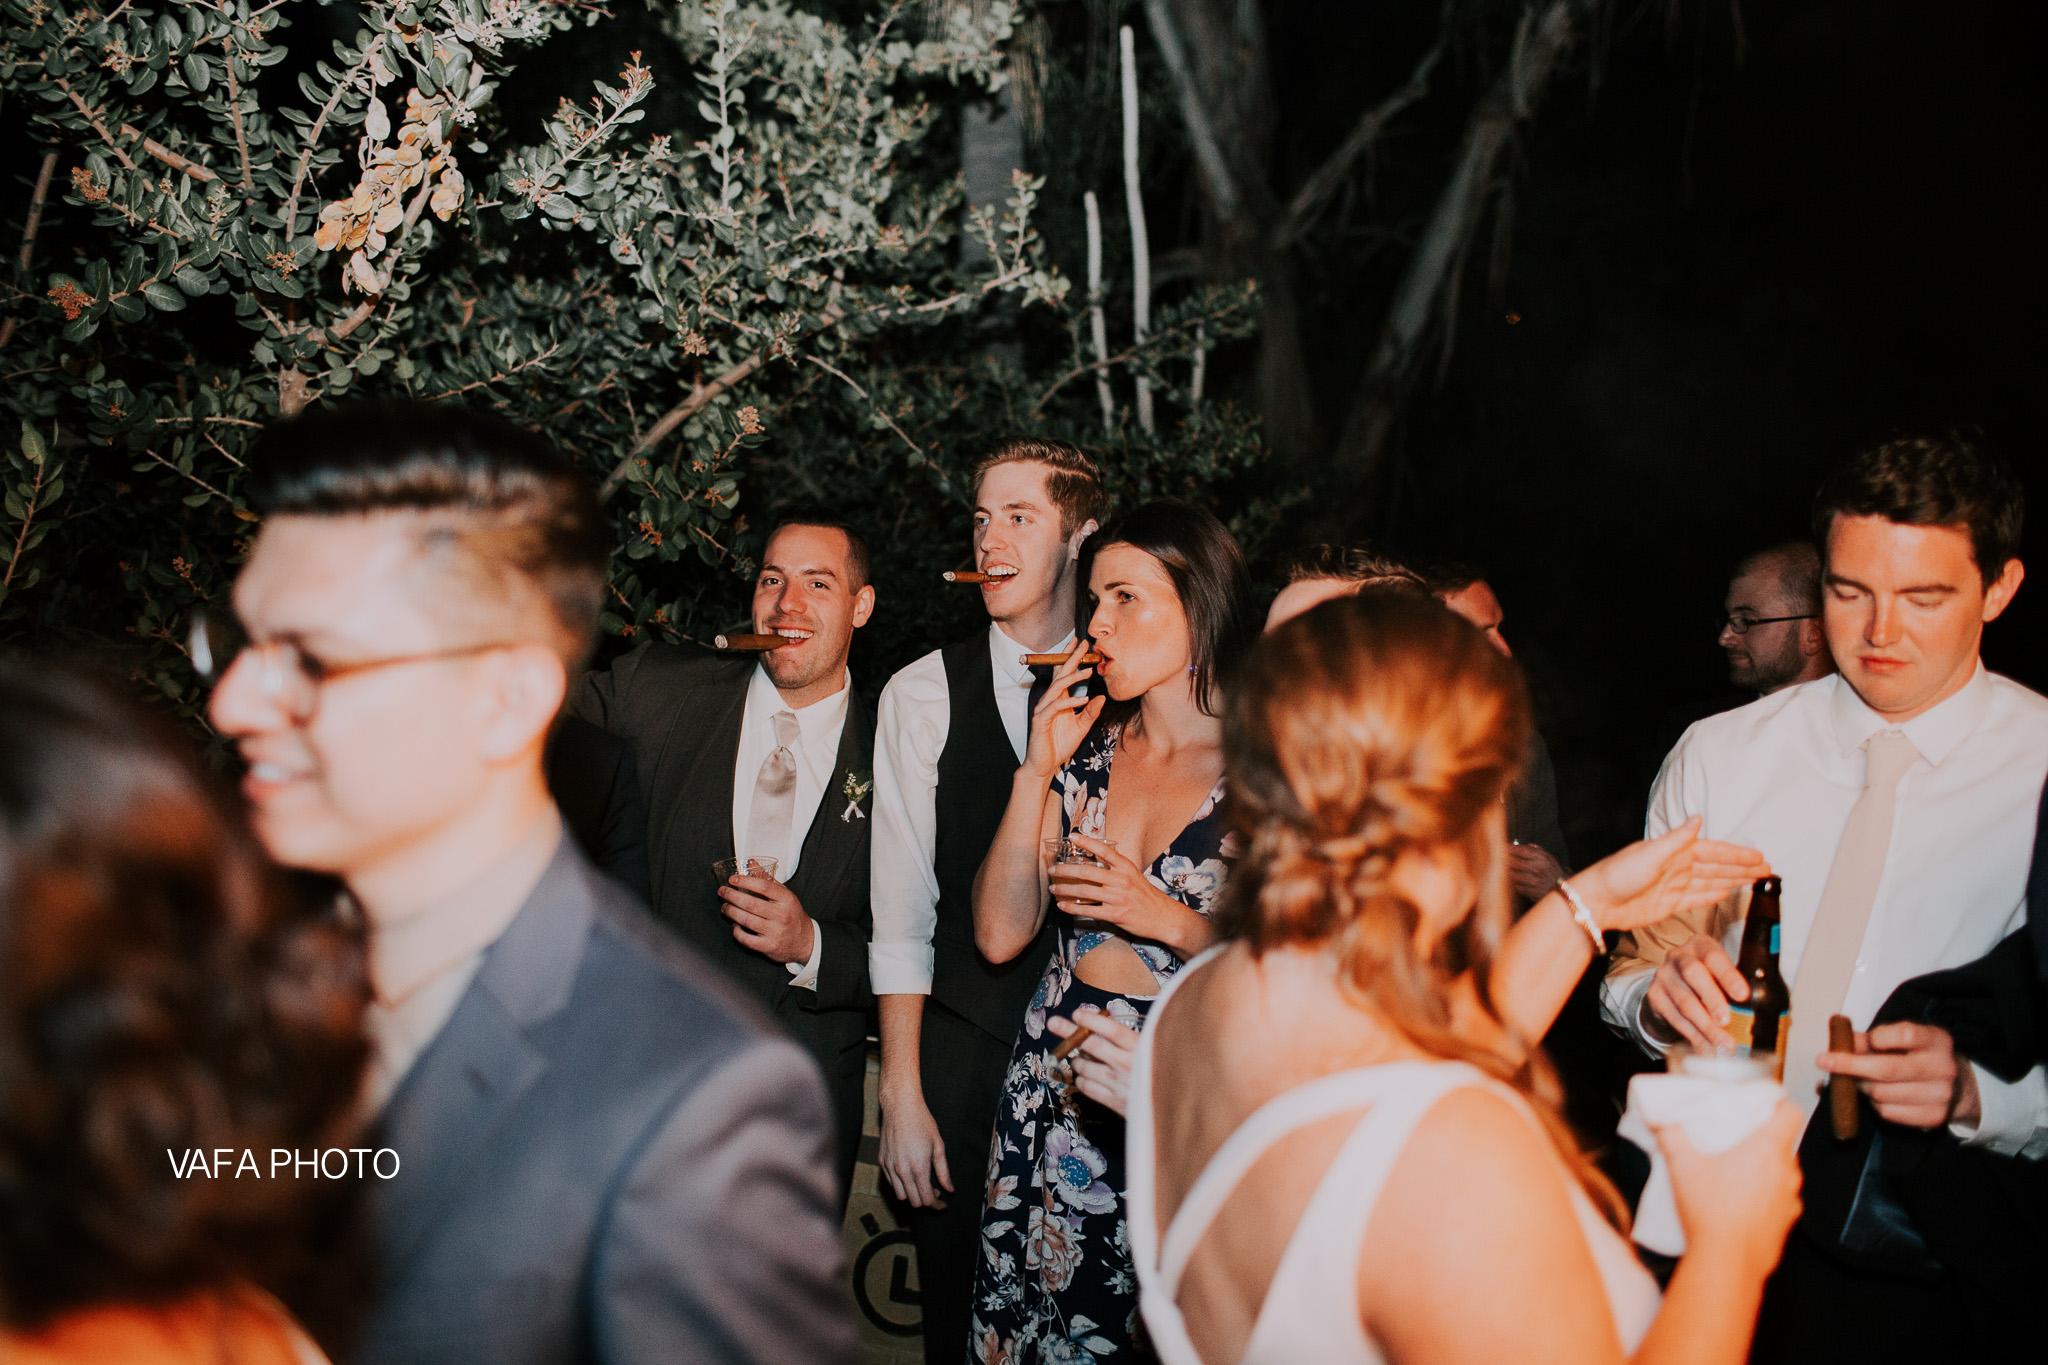 Leo-Carrillo-Ranch-Wedding-Lauren-Mike-Vafa-Photo-1116.jpg